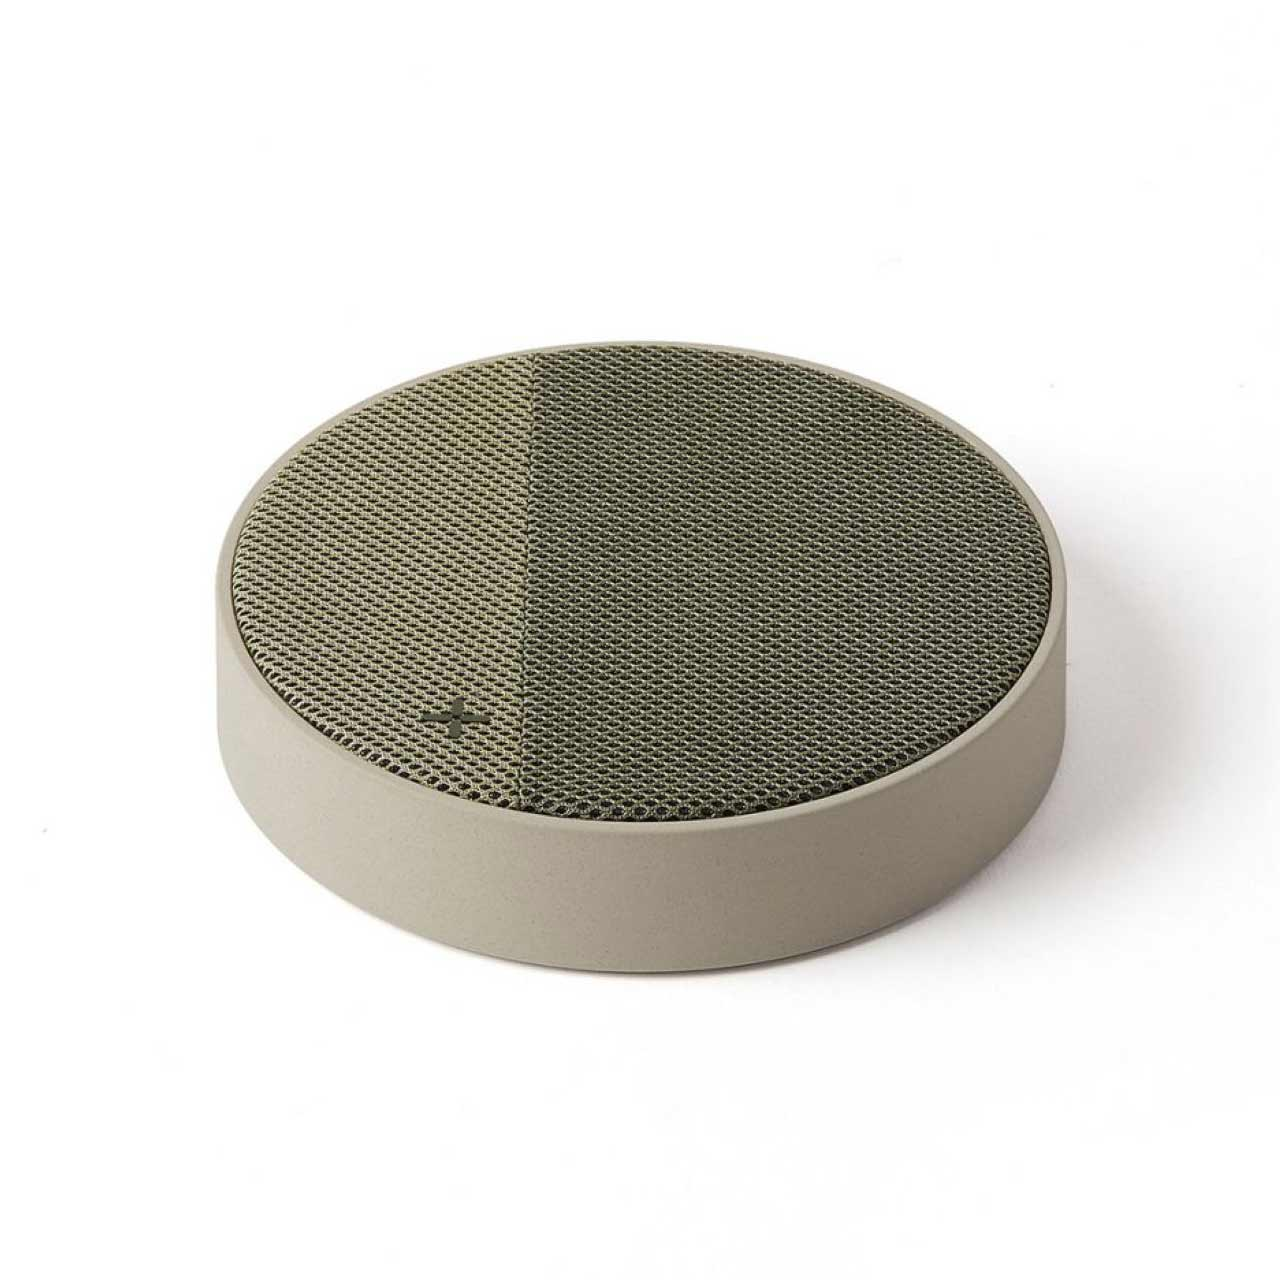 LEXON Oslo Energy Light Grey/Green Charging Station & Bluetooth Speaker | the design gift shop